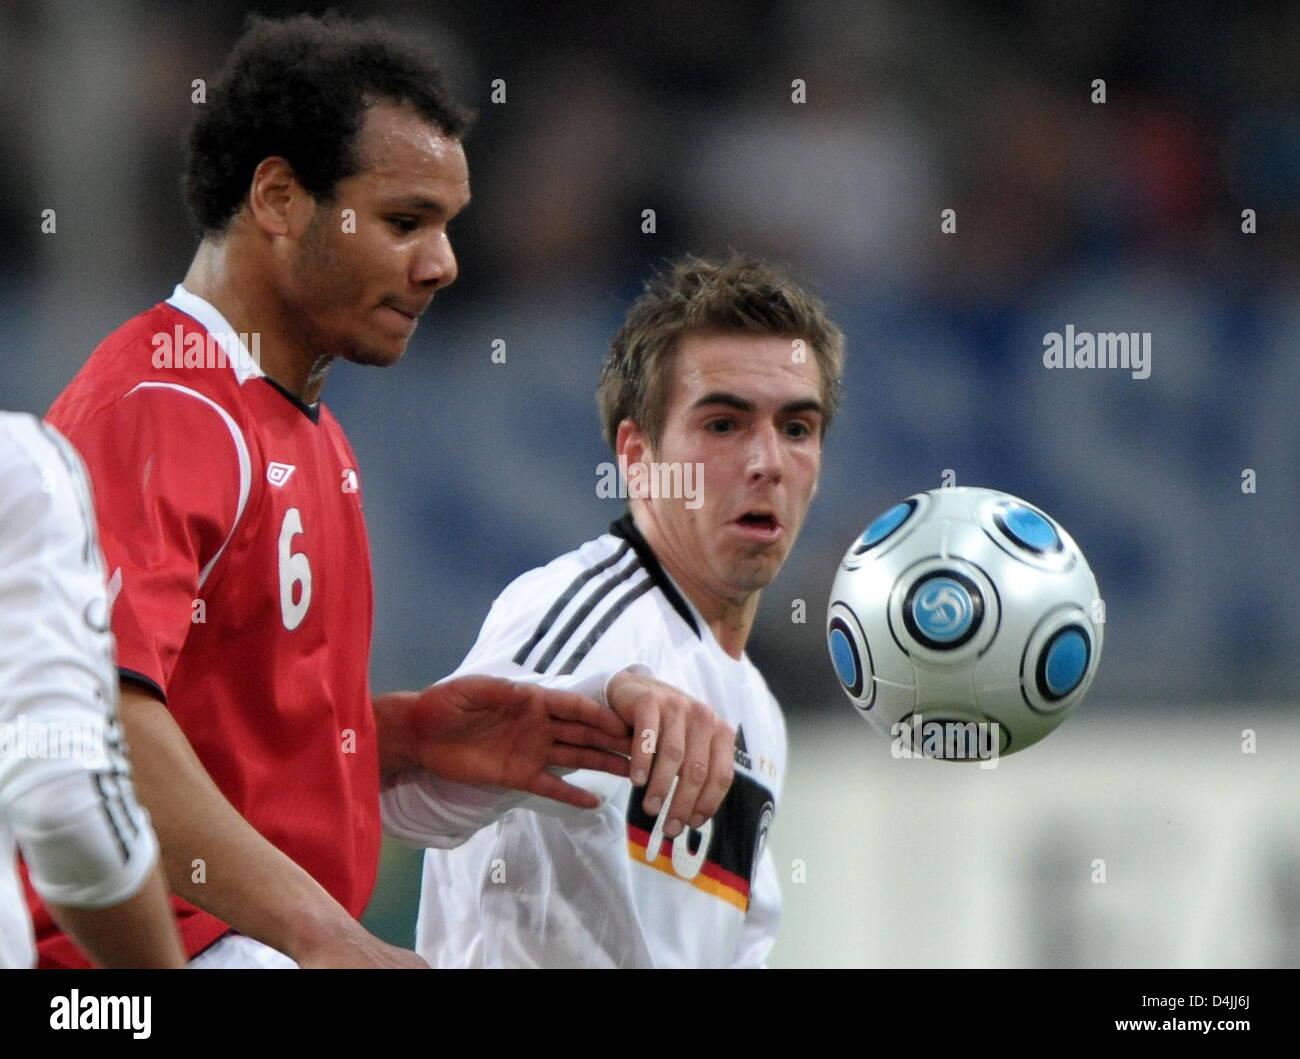 Germany?s Philipp Lahm (R) and Norway?s Daniel Braaten seen